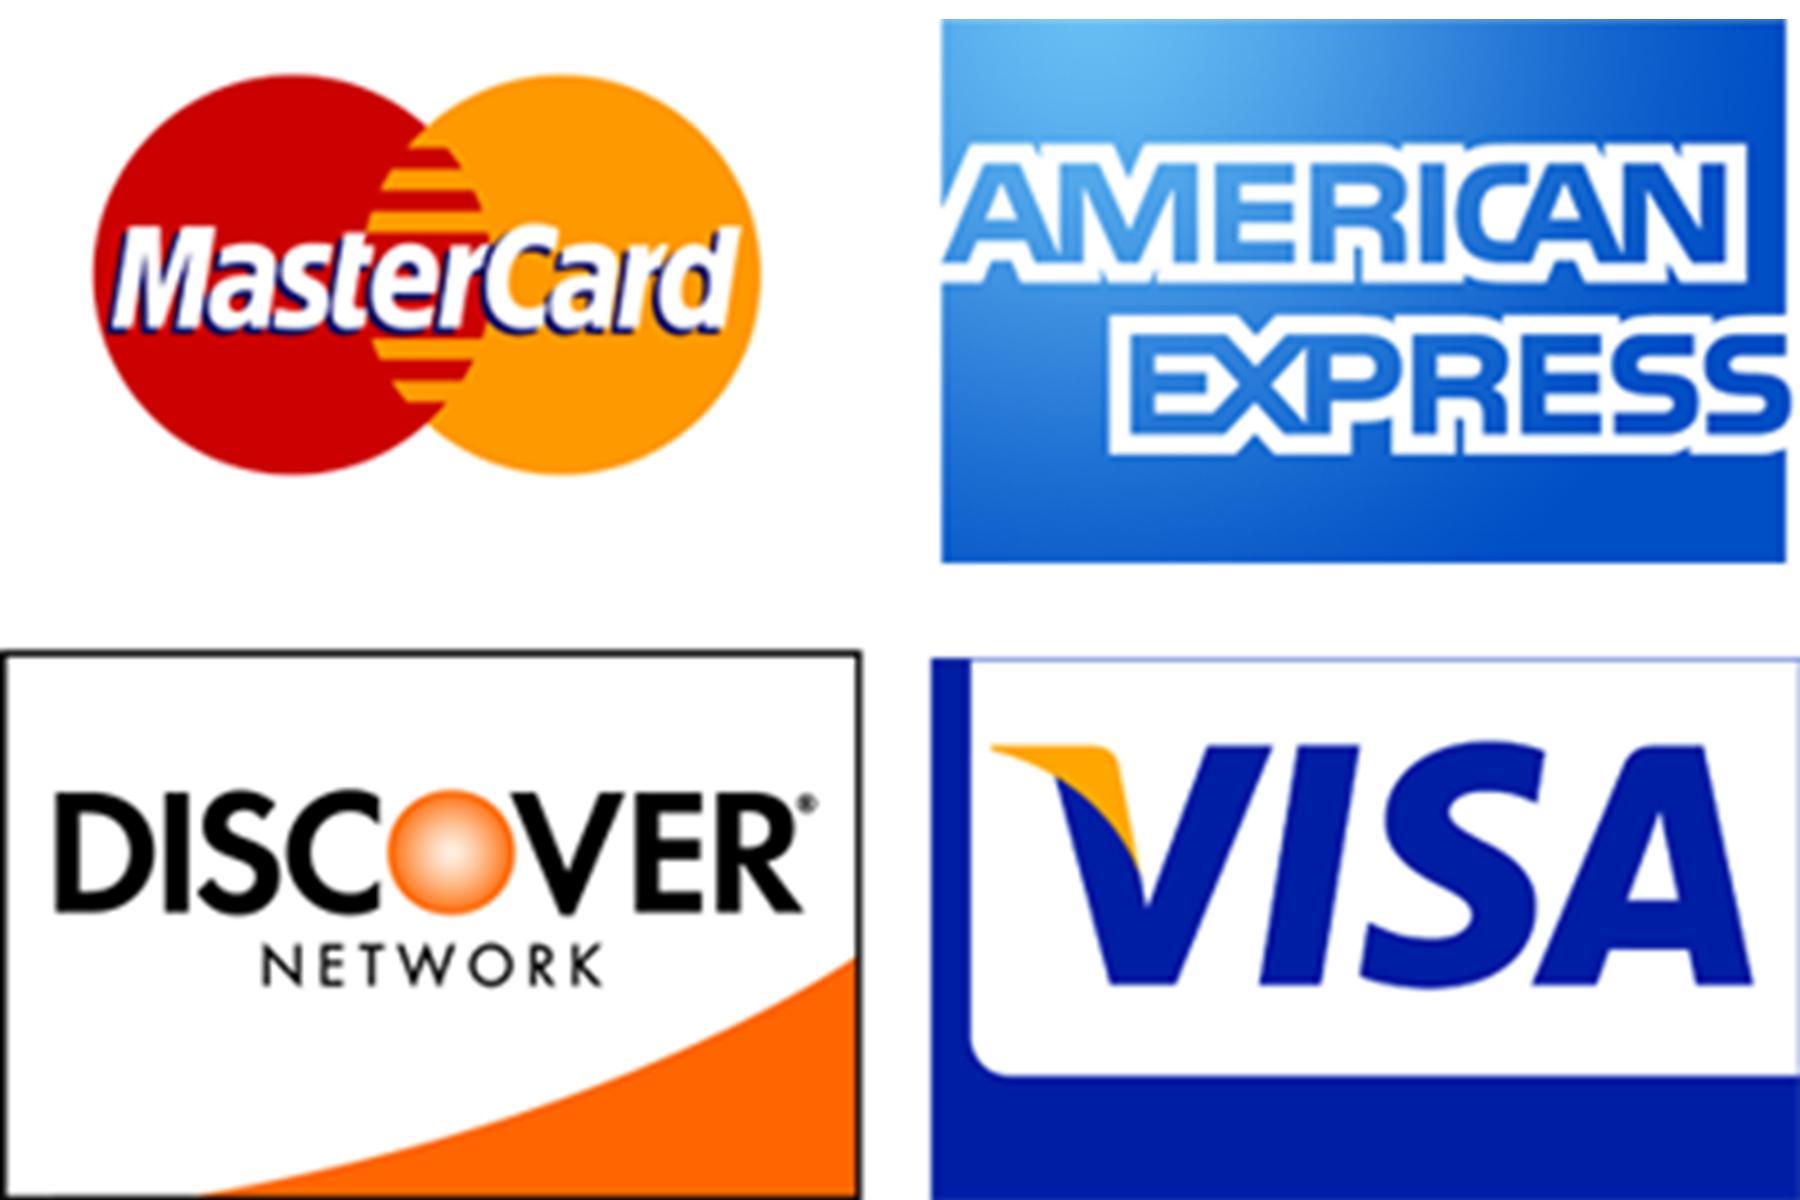 credit-card-logos_271166